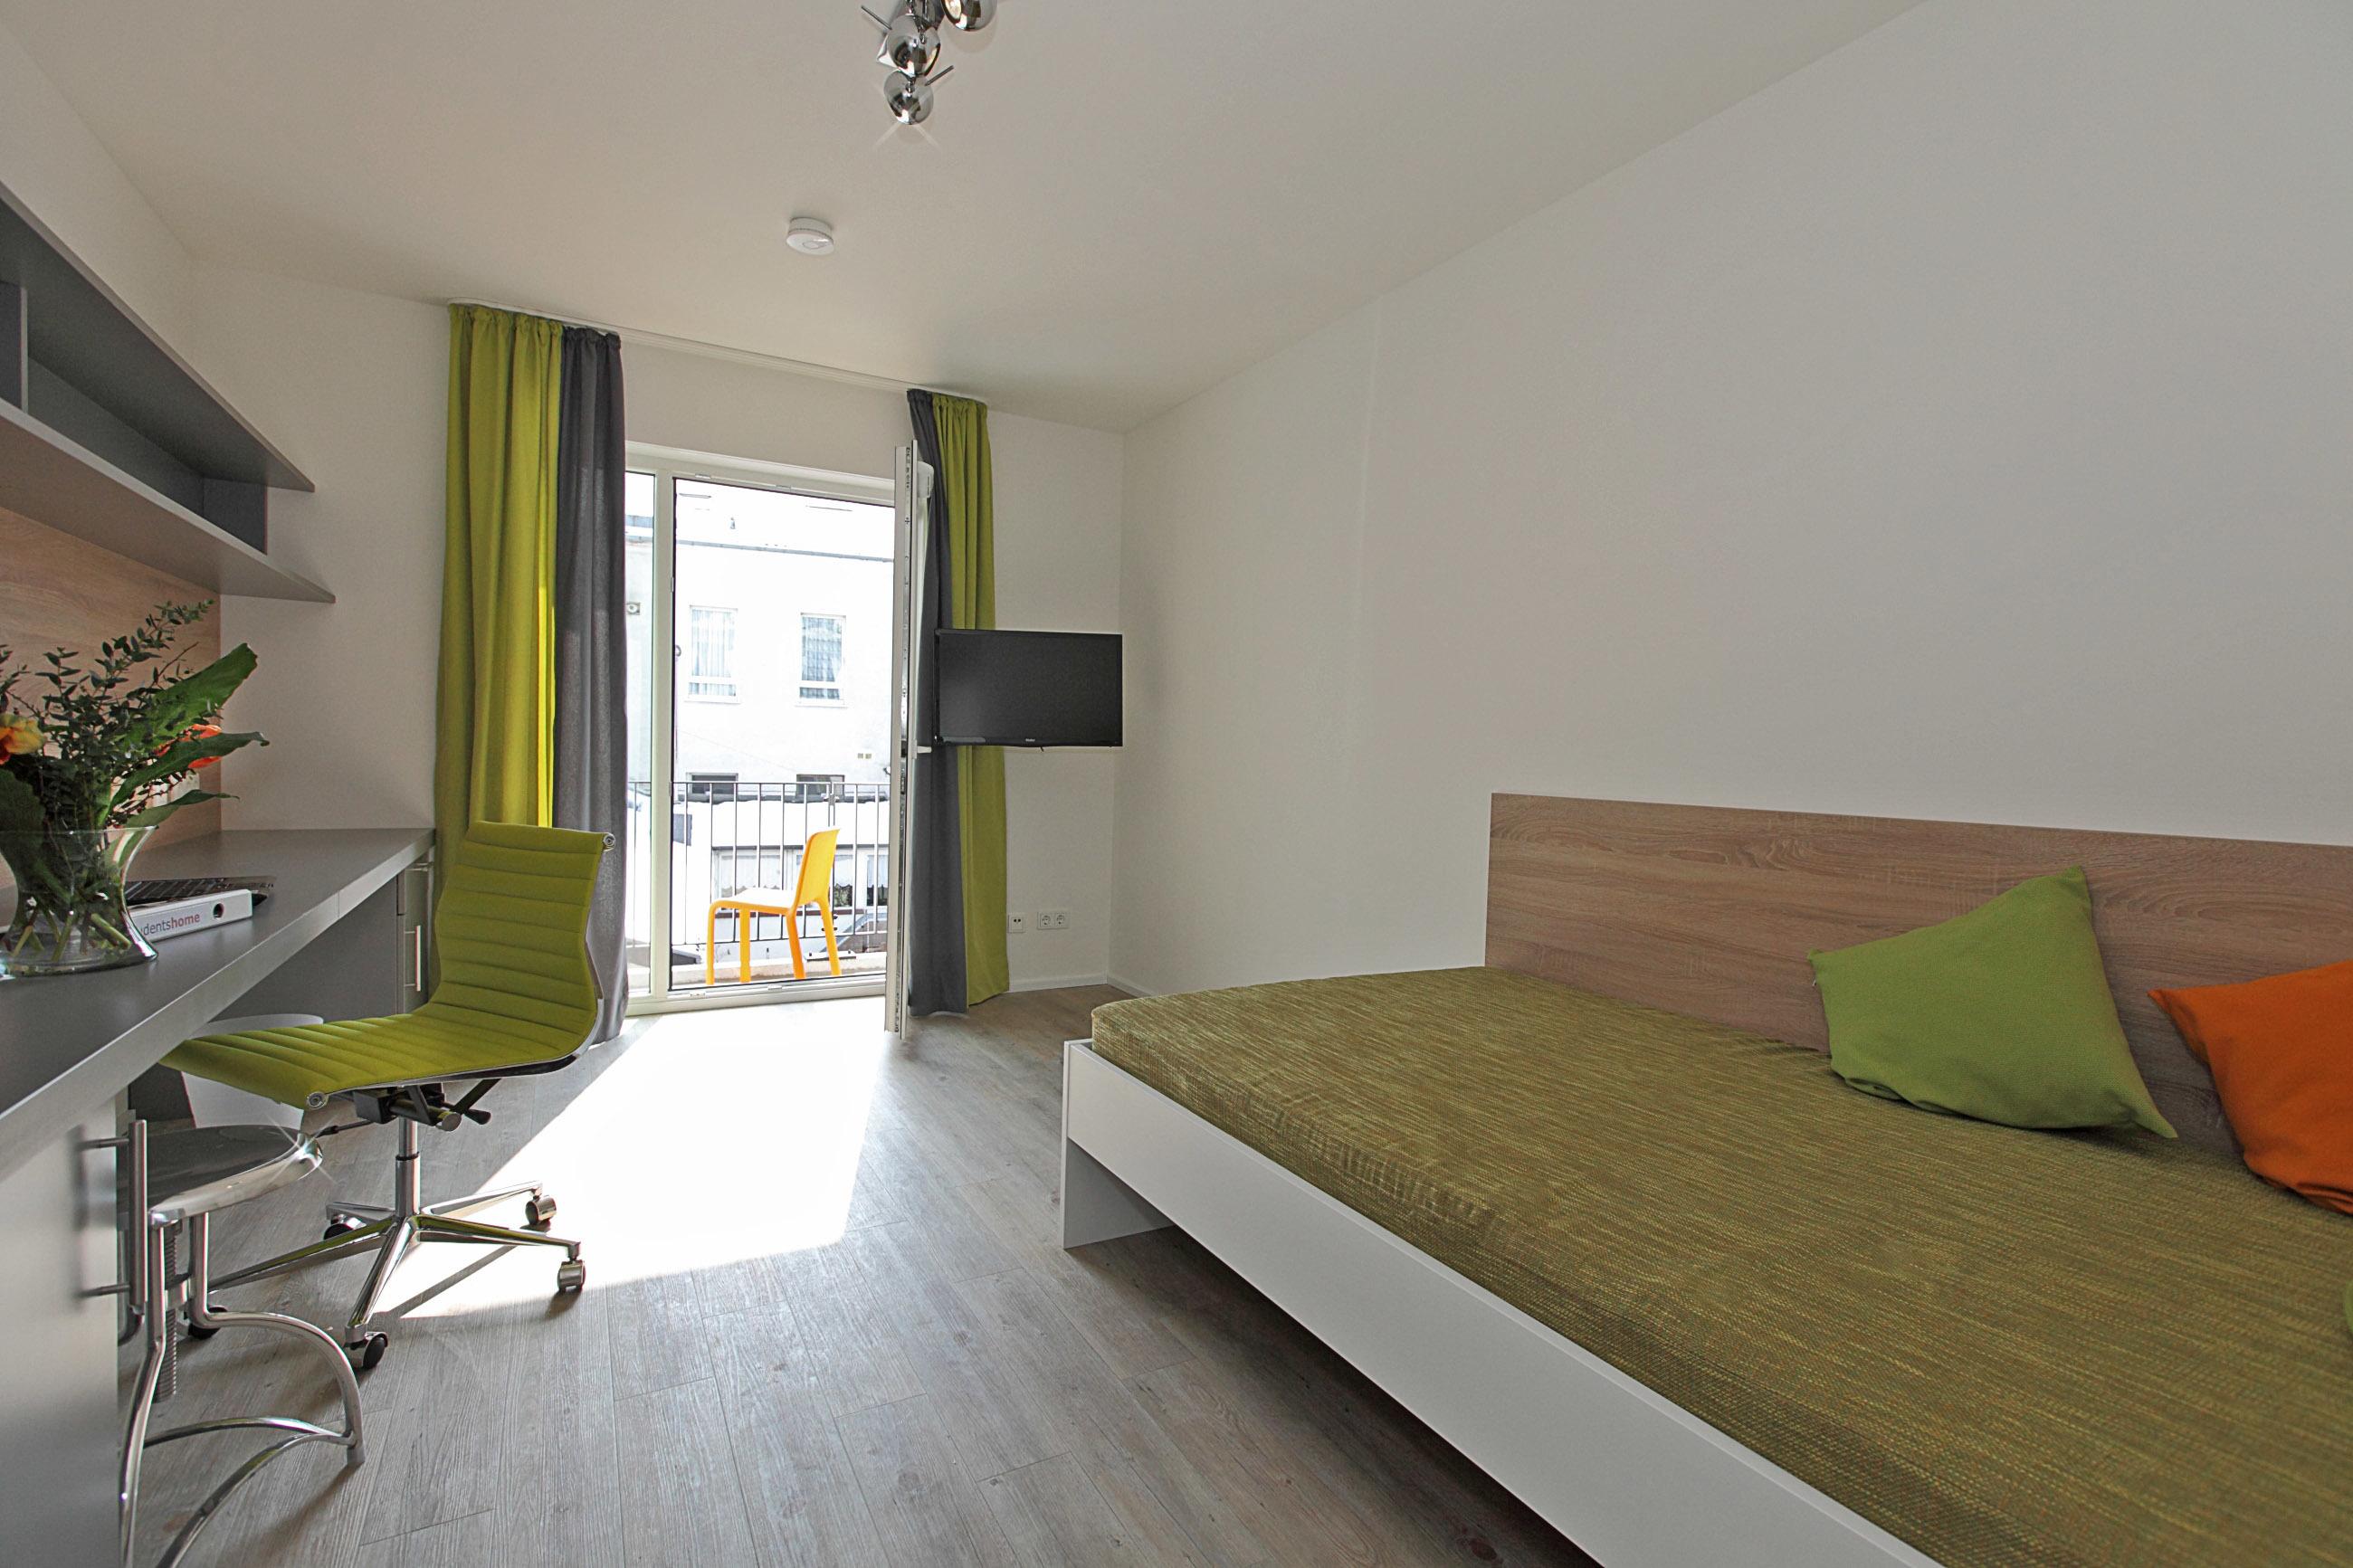 studentenwohnheim bonn m blierte wohnung wg bonn. Black Bedroom Furniture Sets. Home Design Ideas